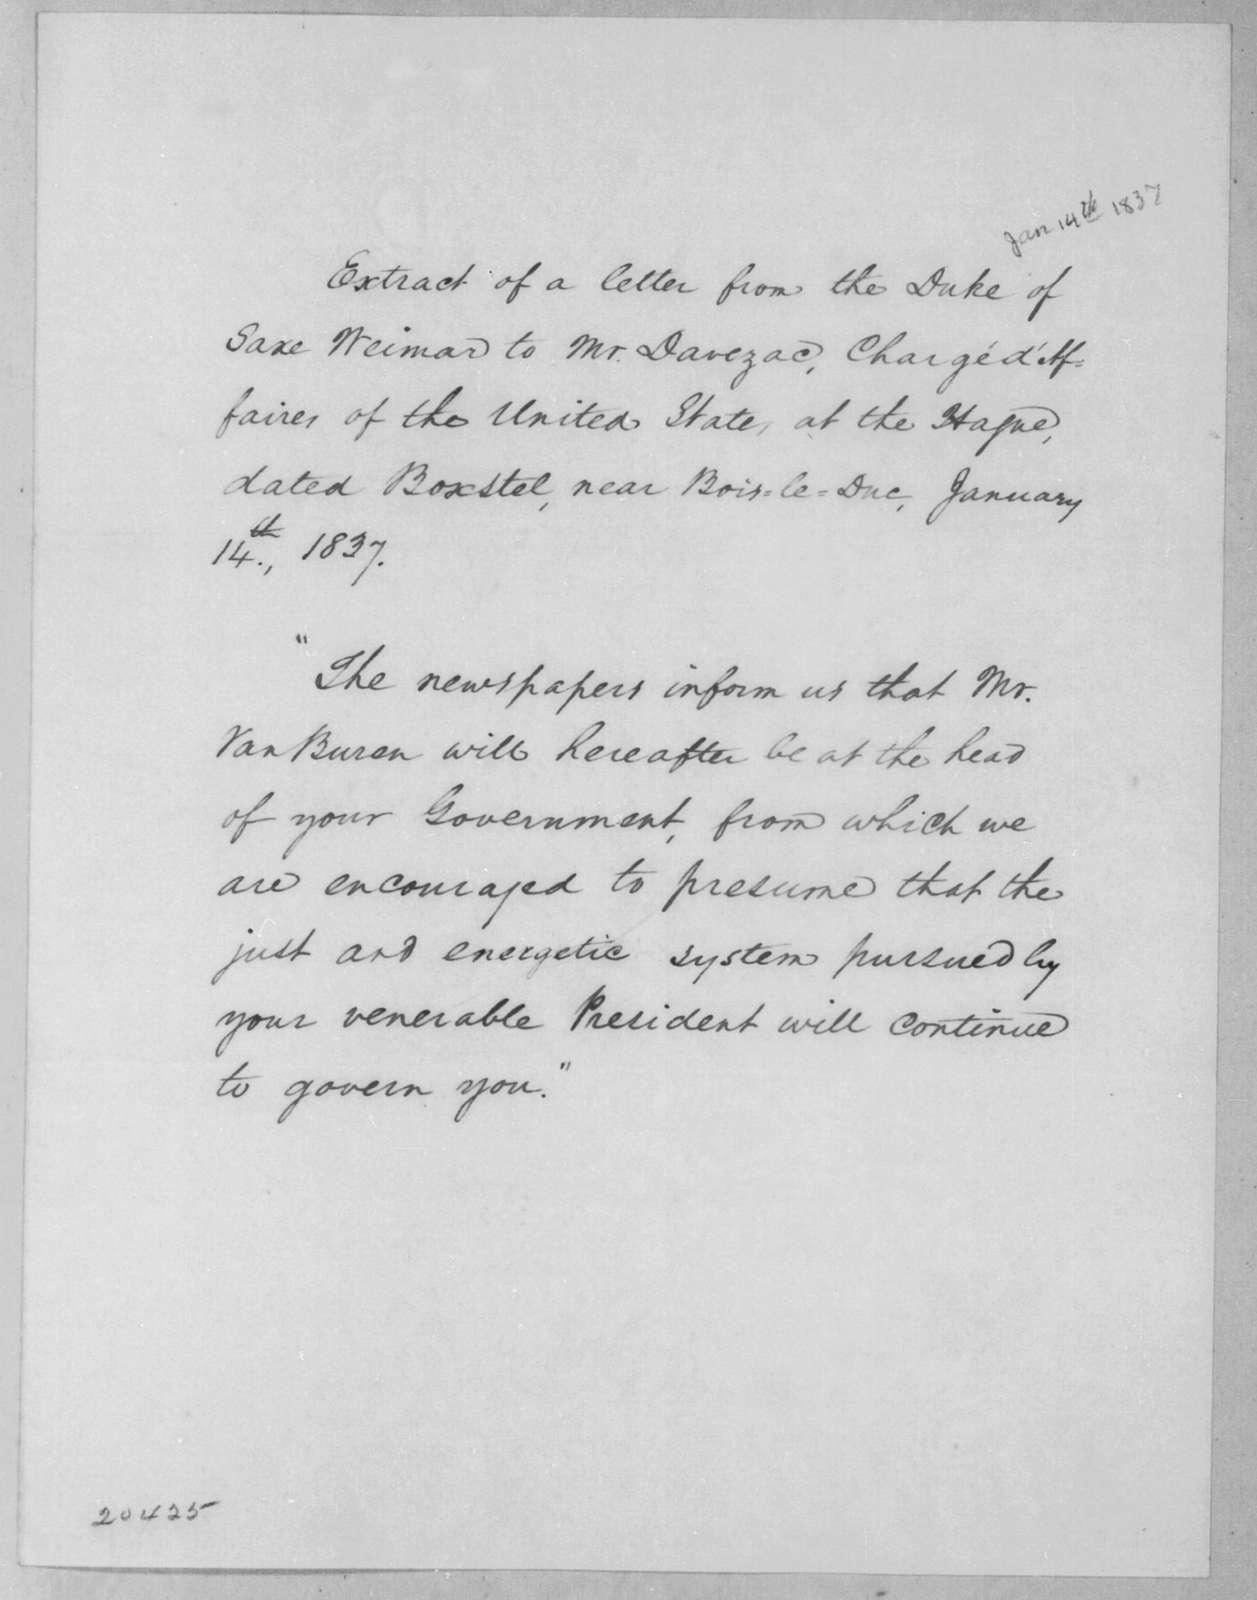 [Duke] Saxe-Weitmar to Auguste Genevieve Valentin Davezac, January 14, 1837